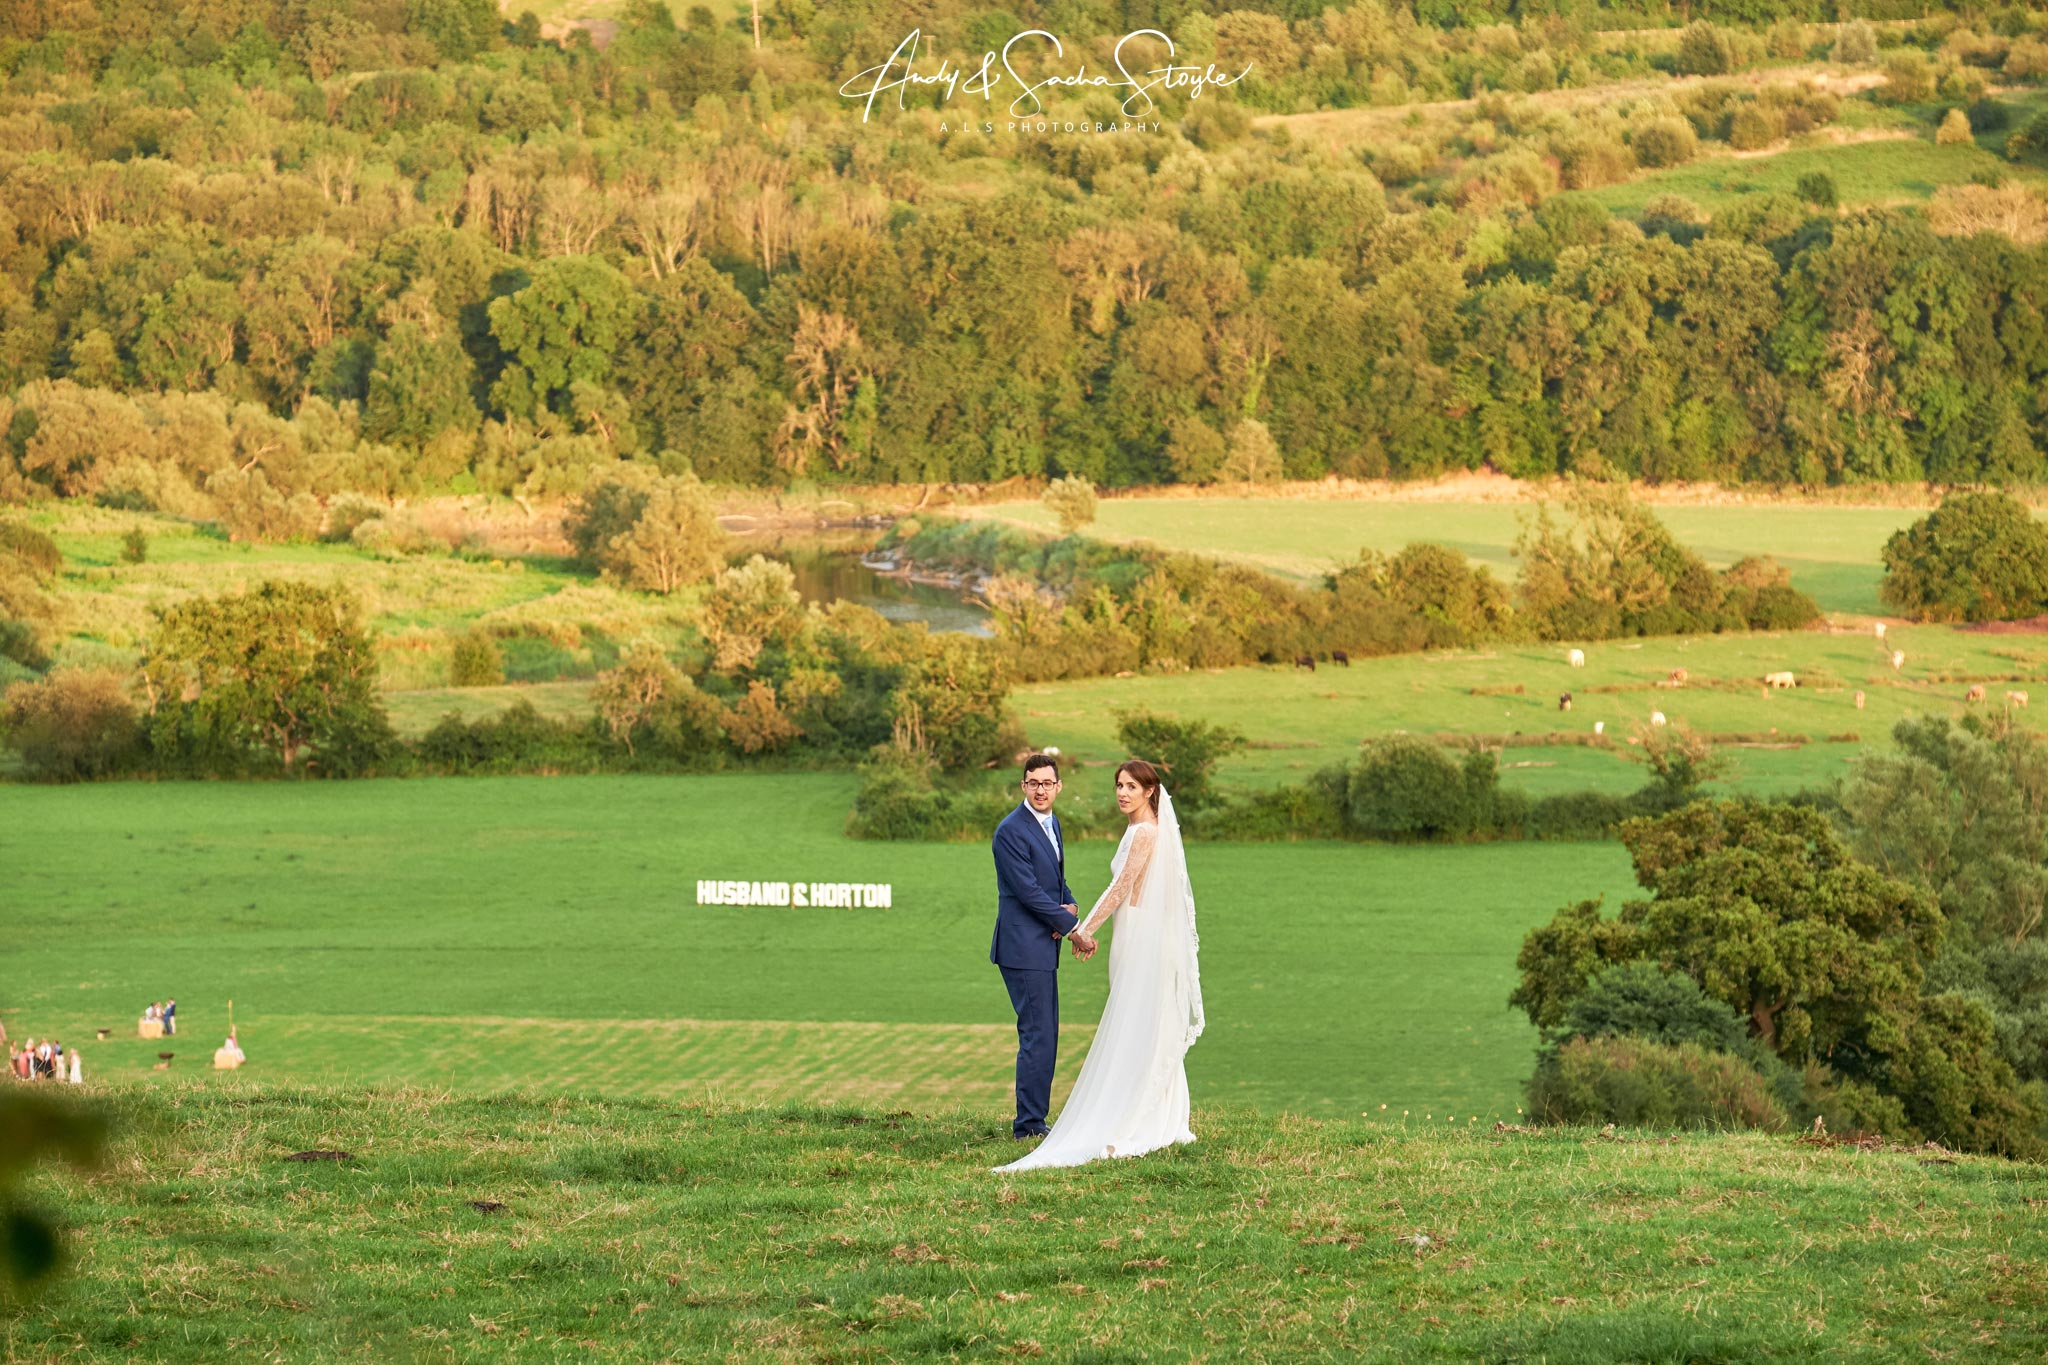 Wedding Photography Caerleon